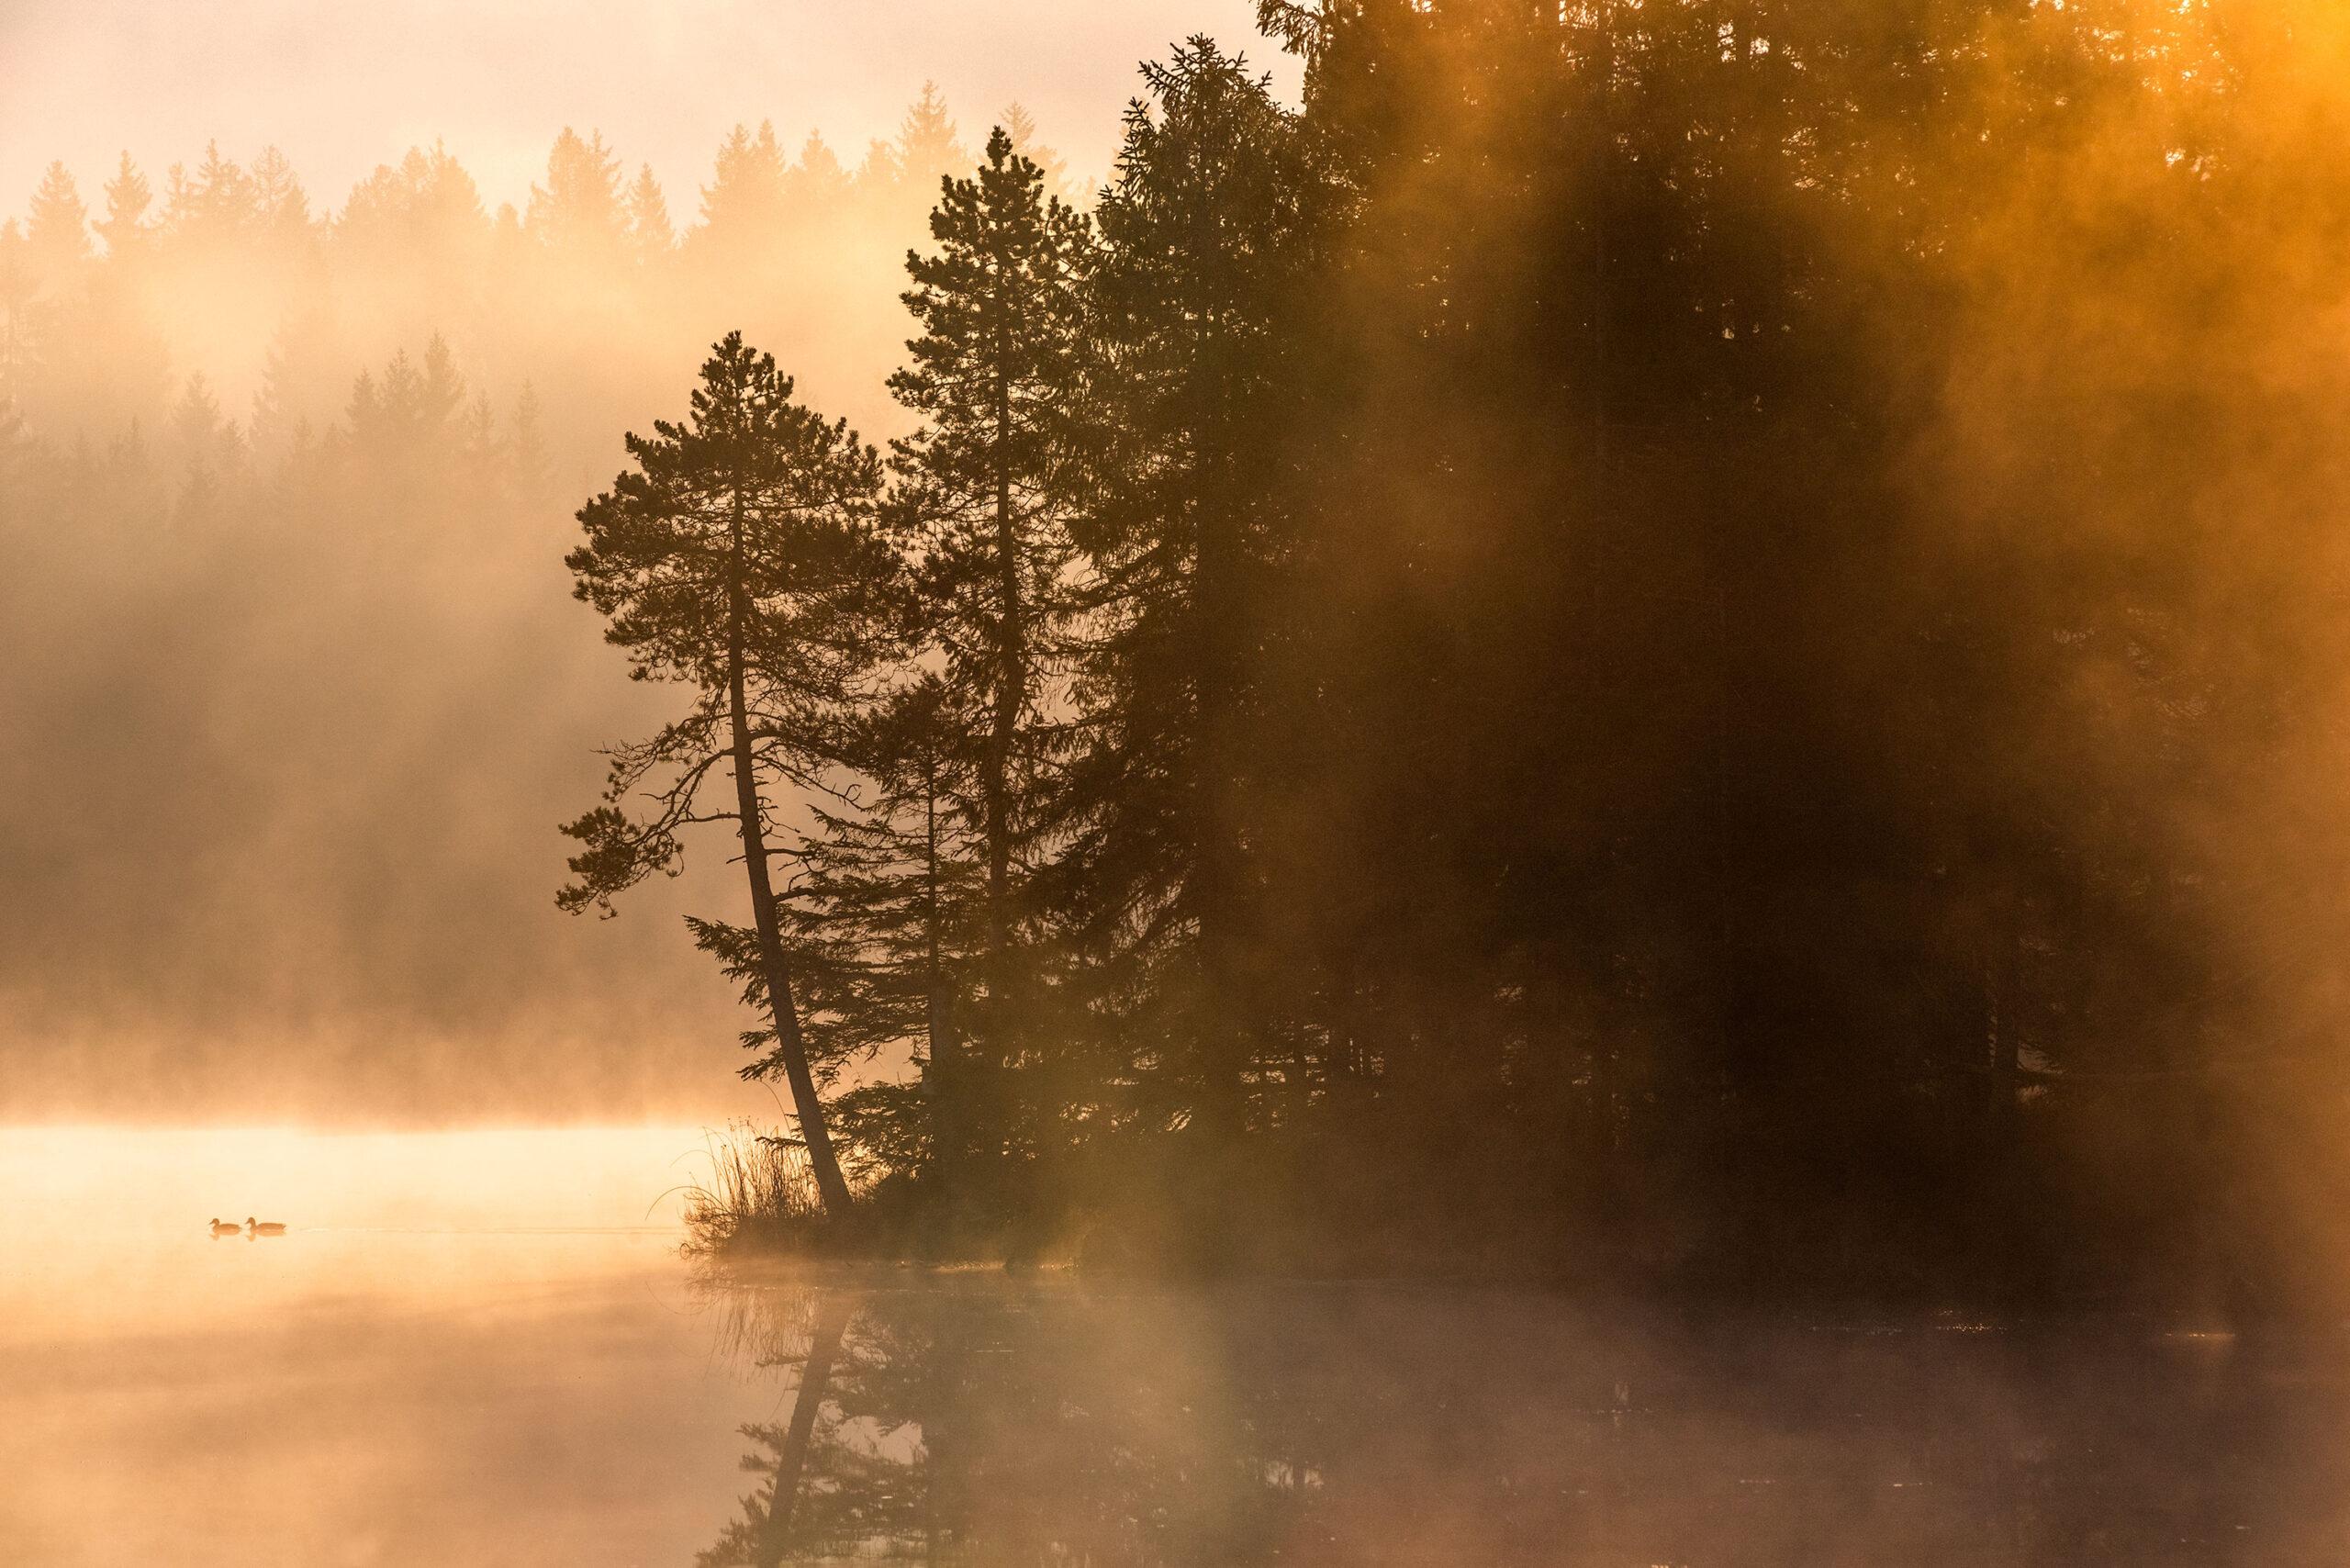 Yellow sunrise photography of the Gruère Lake located in Switzerland. Image by Jennifer Esseiva.